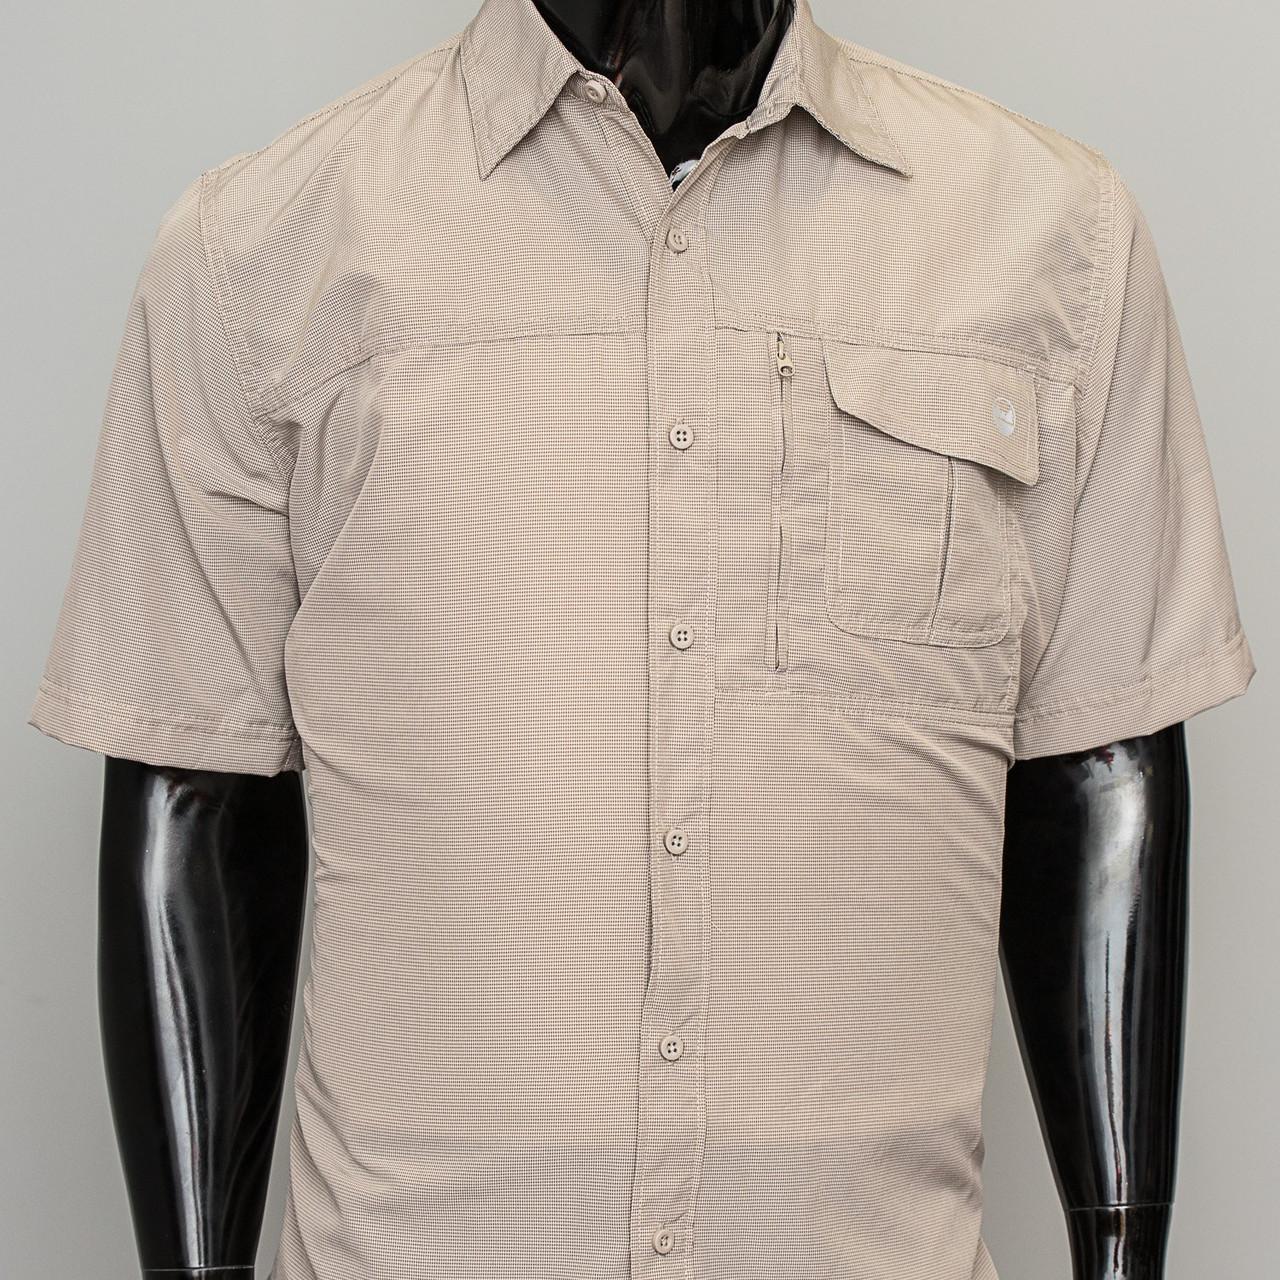 Premier Discreet Executive Vest - NIJ Level IIIA - Black